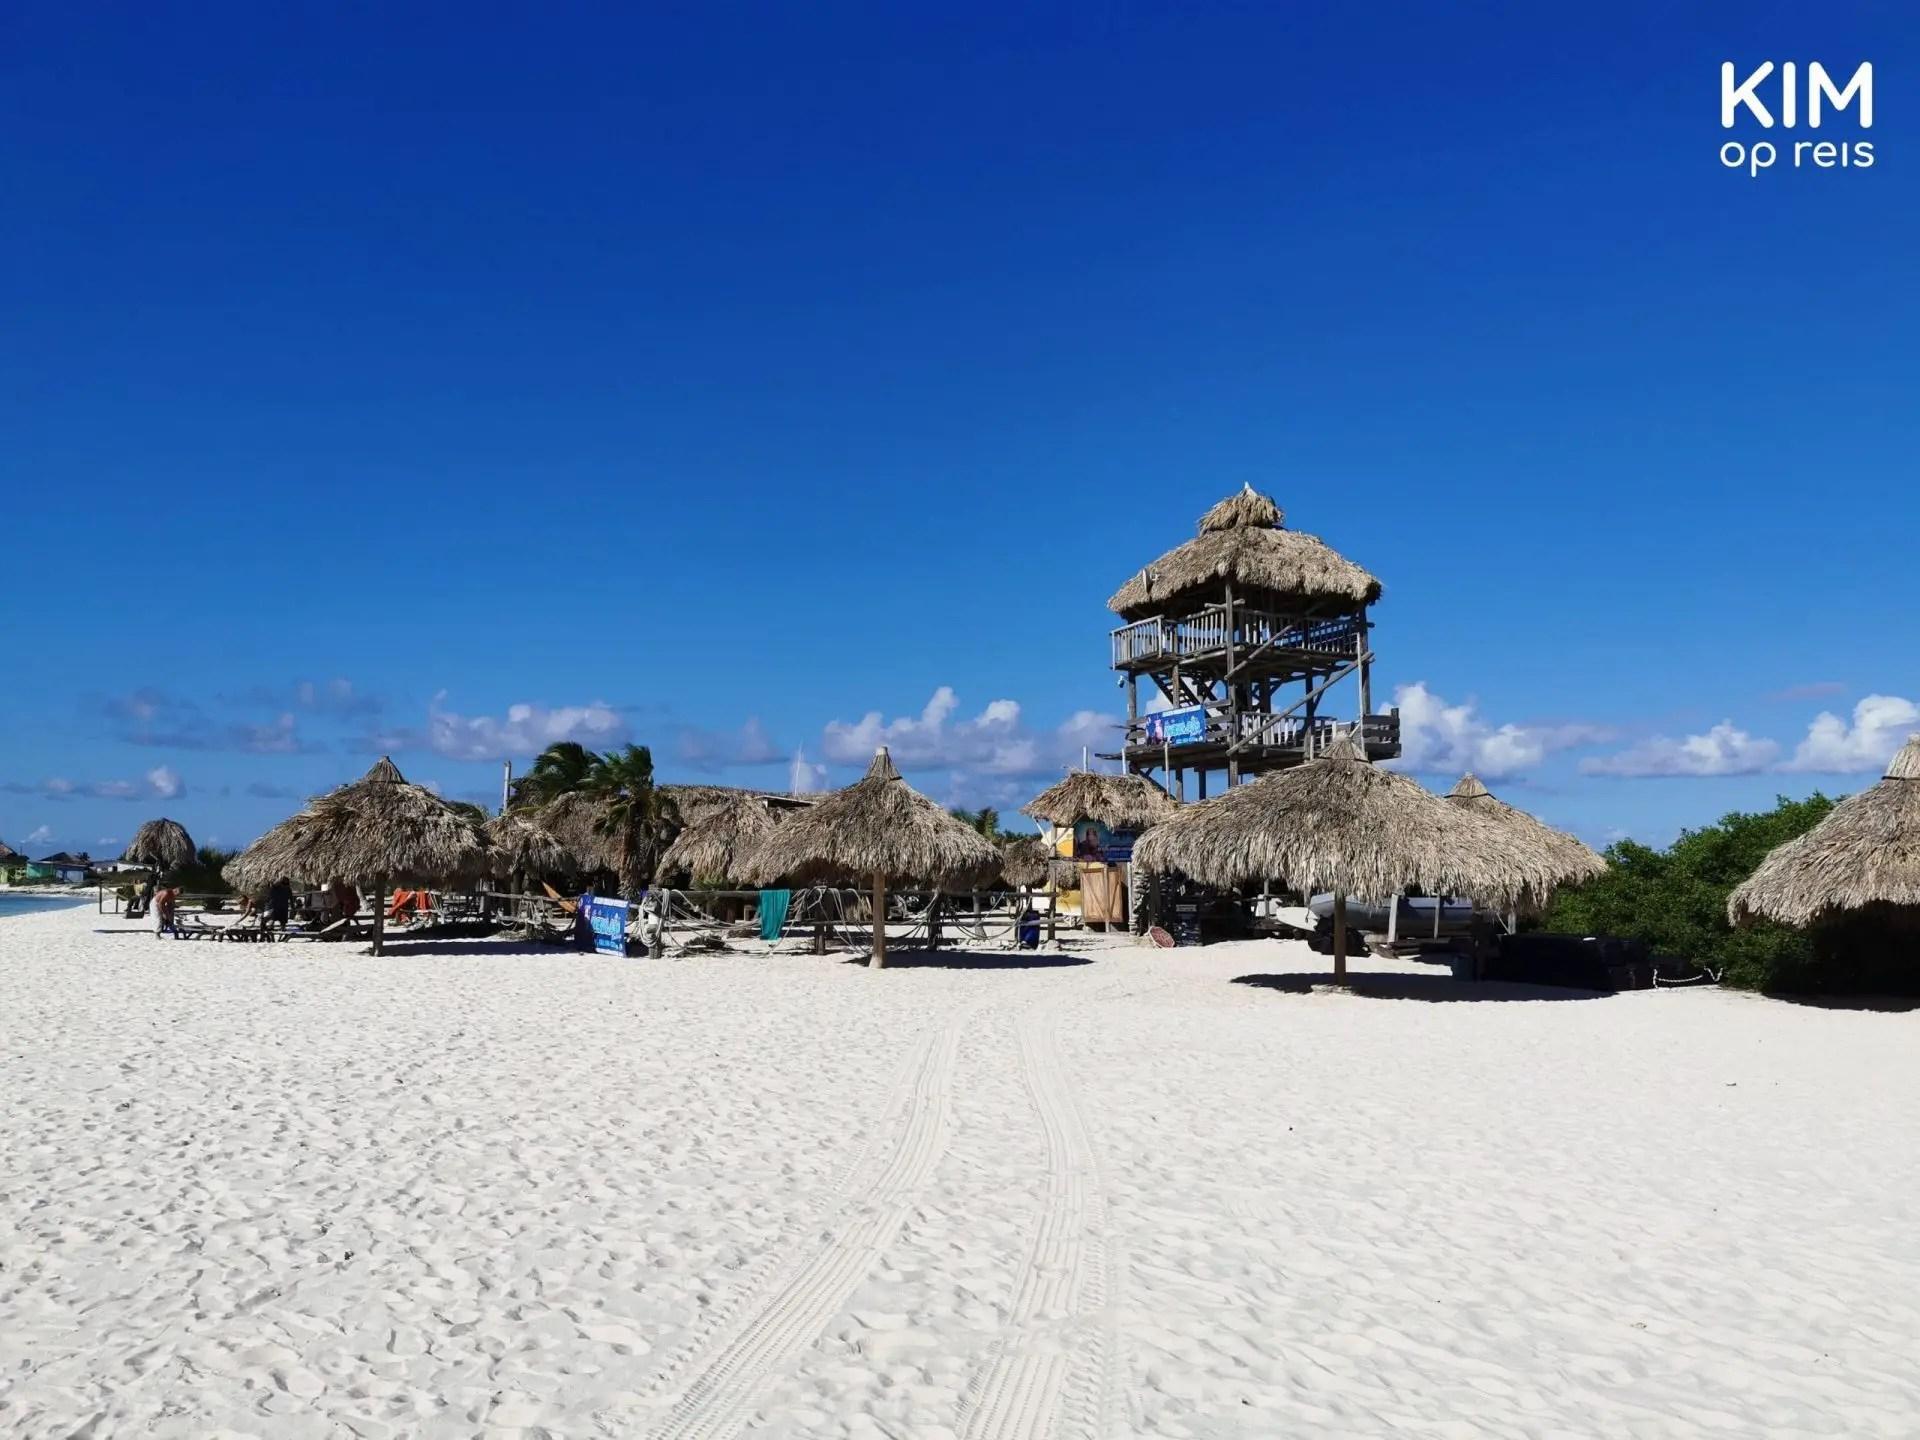 Mermaid beach house Klein Curaçao: beach house with umbrellas and a watchtower